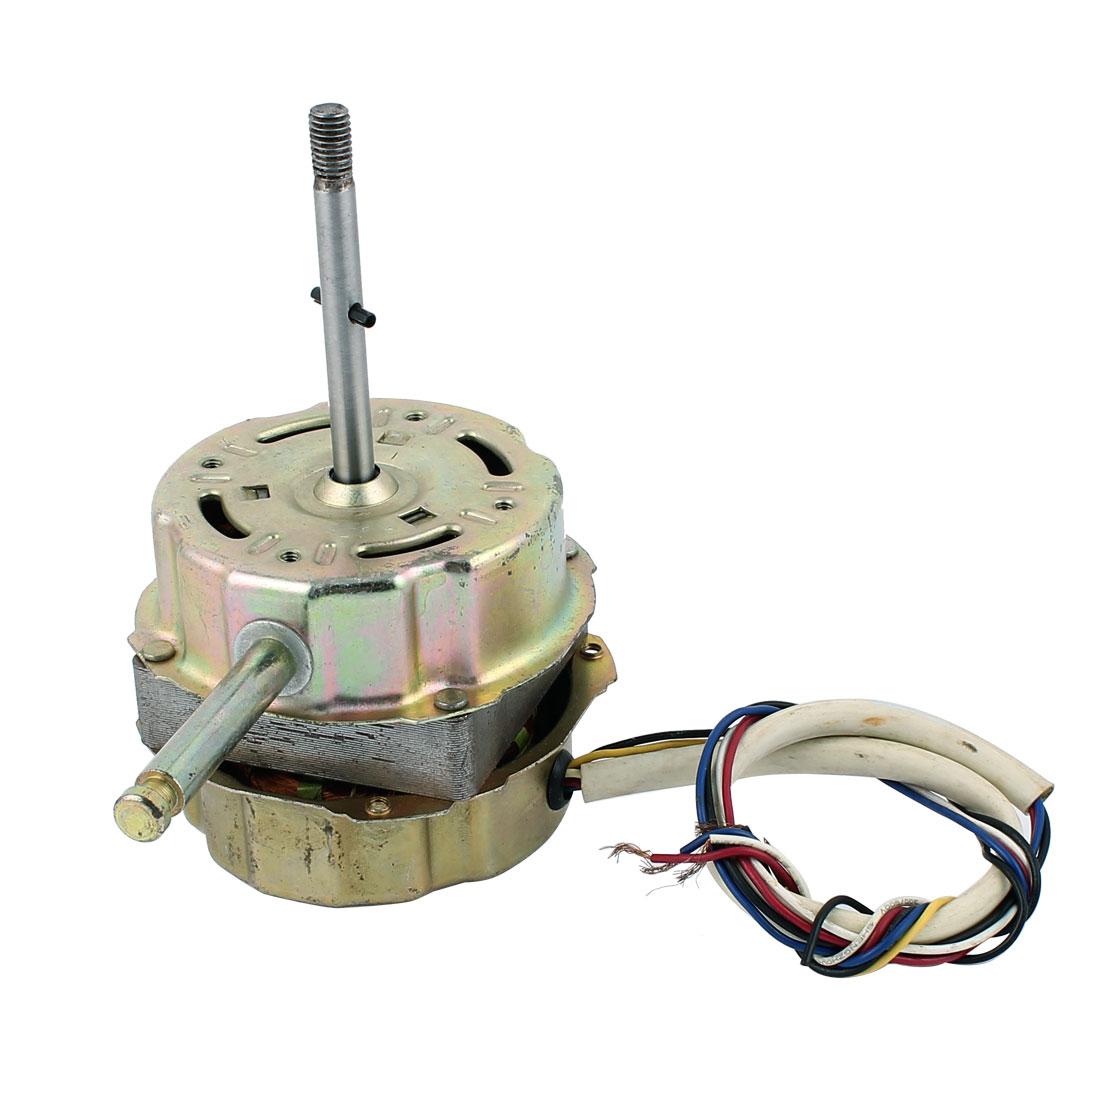 AC 220V 0.2A 10W 1200RPM 8mmx75mm Shaft Electric Ventilator Fan Motor